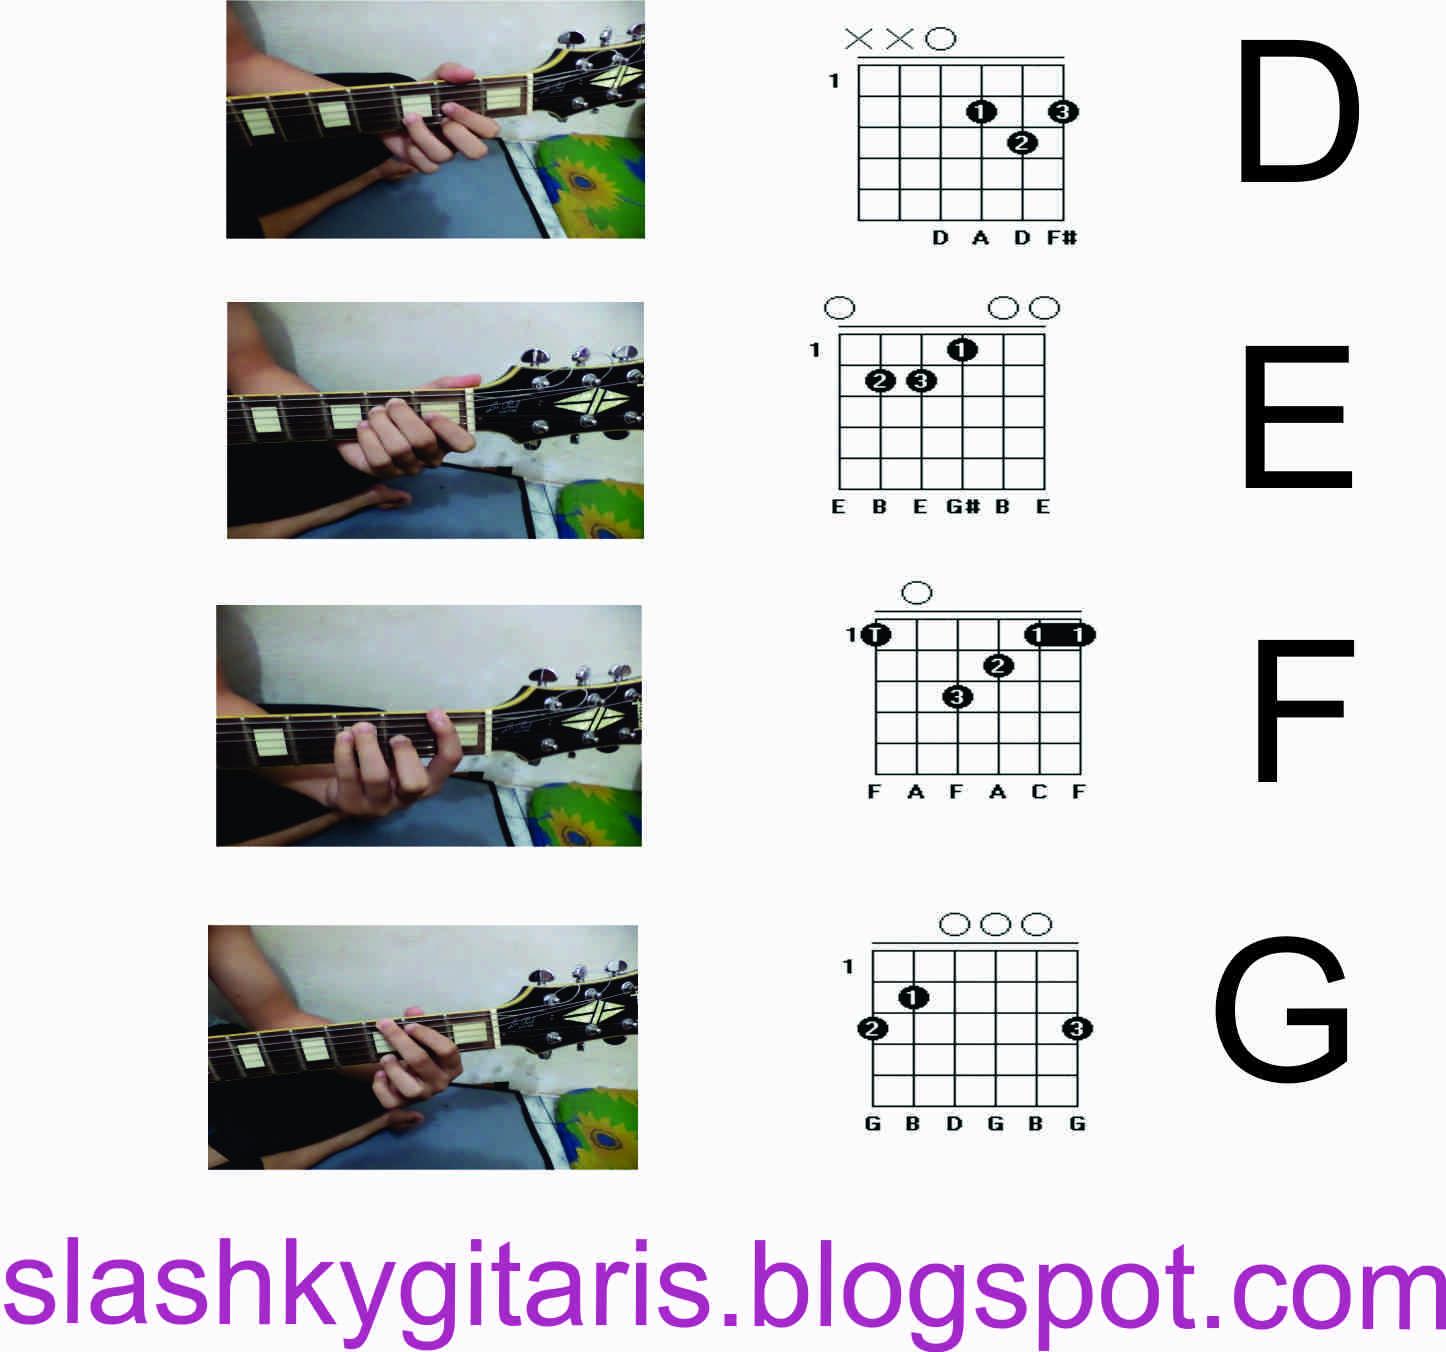 Panduan gambar chord chord gitar untuk pemula part 1 belajar cepat gitar belajar gitar belajar gitar akustik chord dasar chord major reheart Choice Image